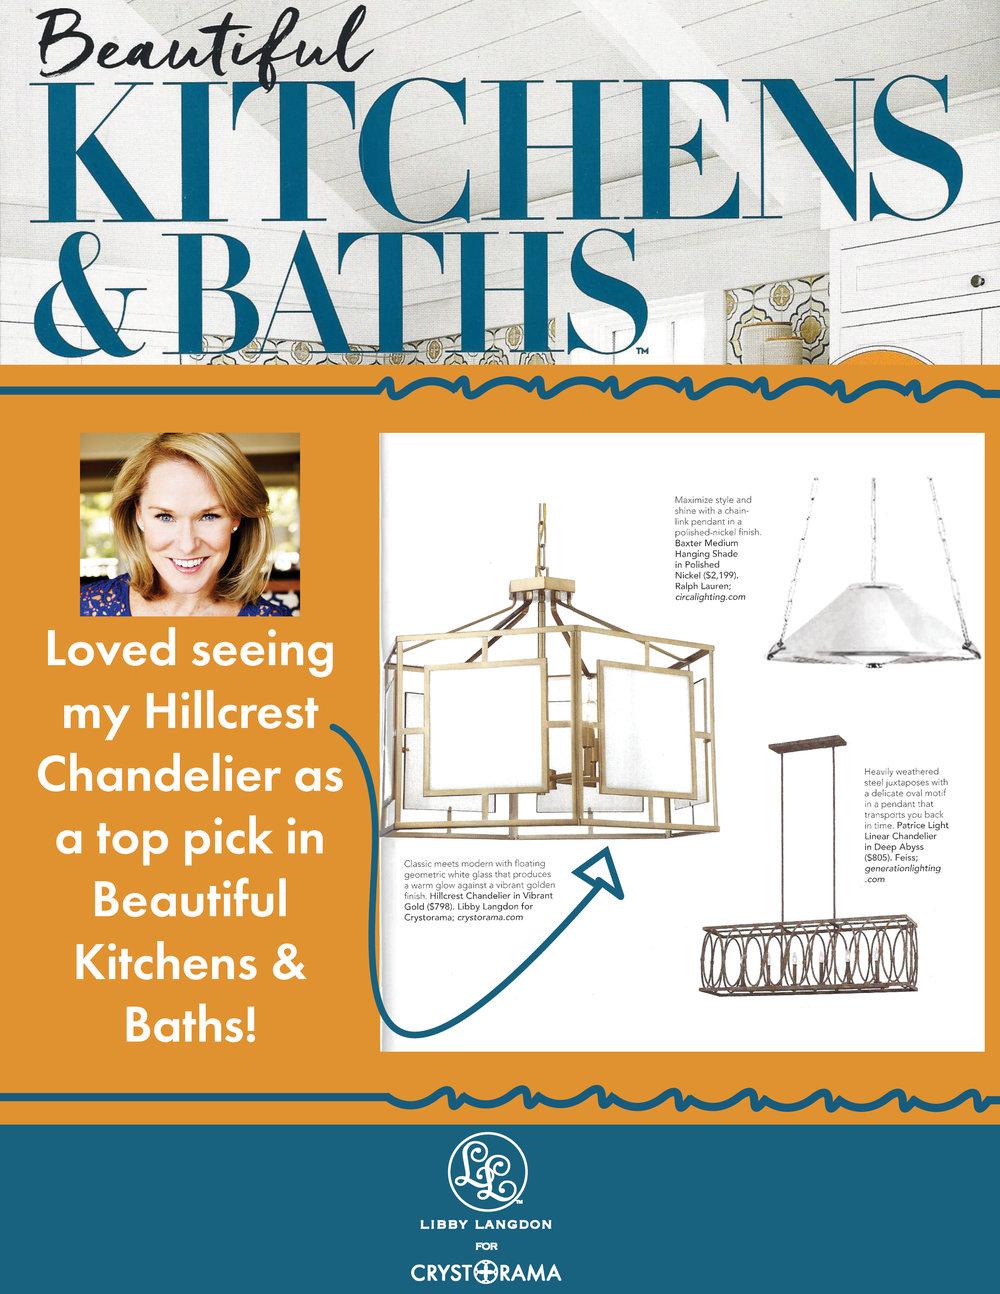 beautiful kitchen and baths.jpg